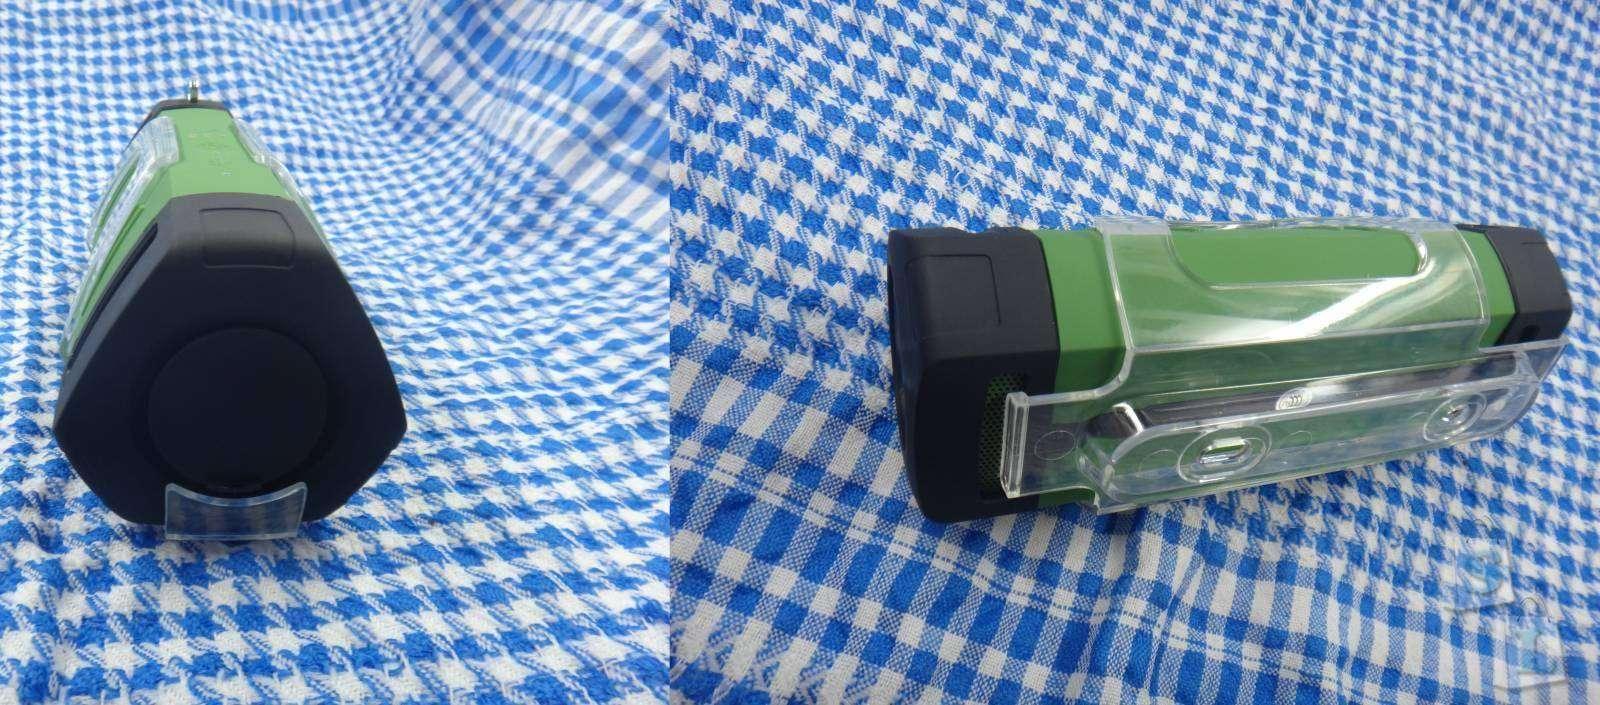 Aliexpress: Внешняя Bluetooth колонка плеер EARSON ER160 с креплением на велосипед